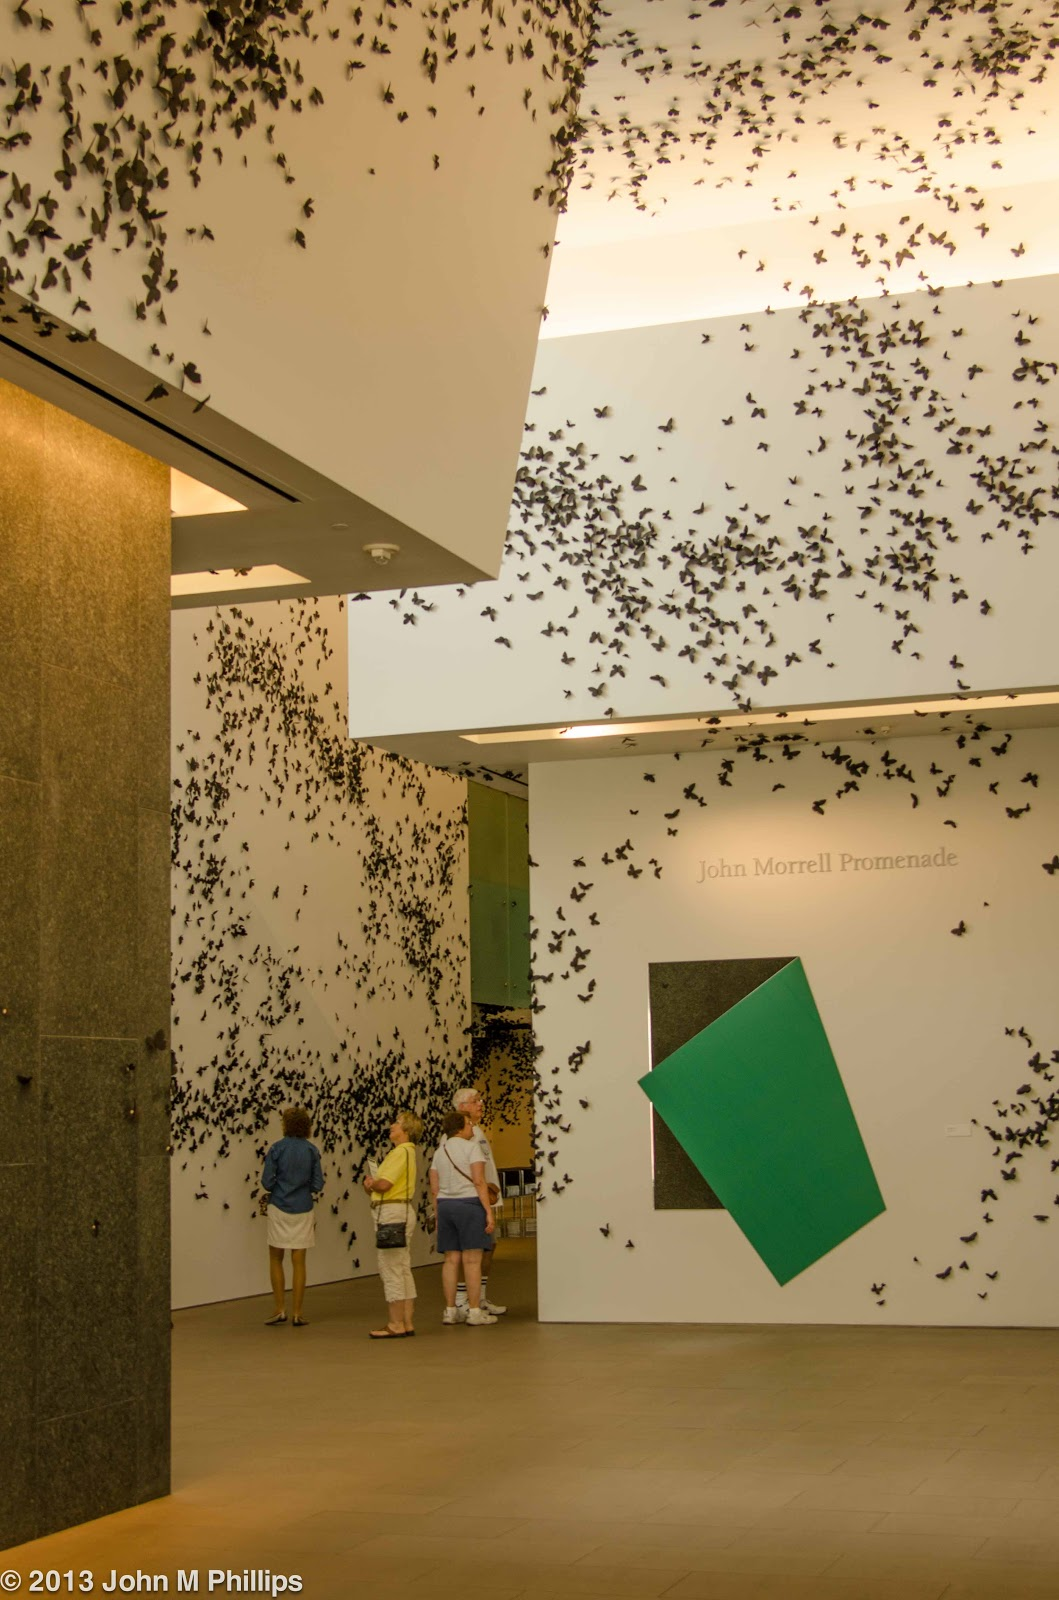 SKEPTIC PHOTO: PHOENIX ART MUSEUM